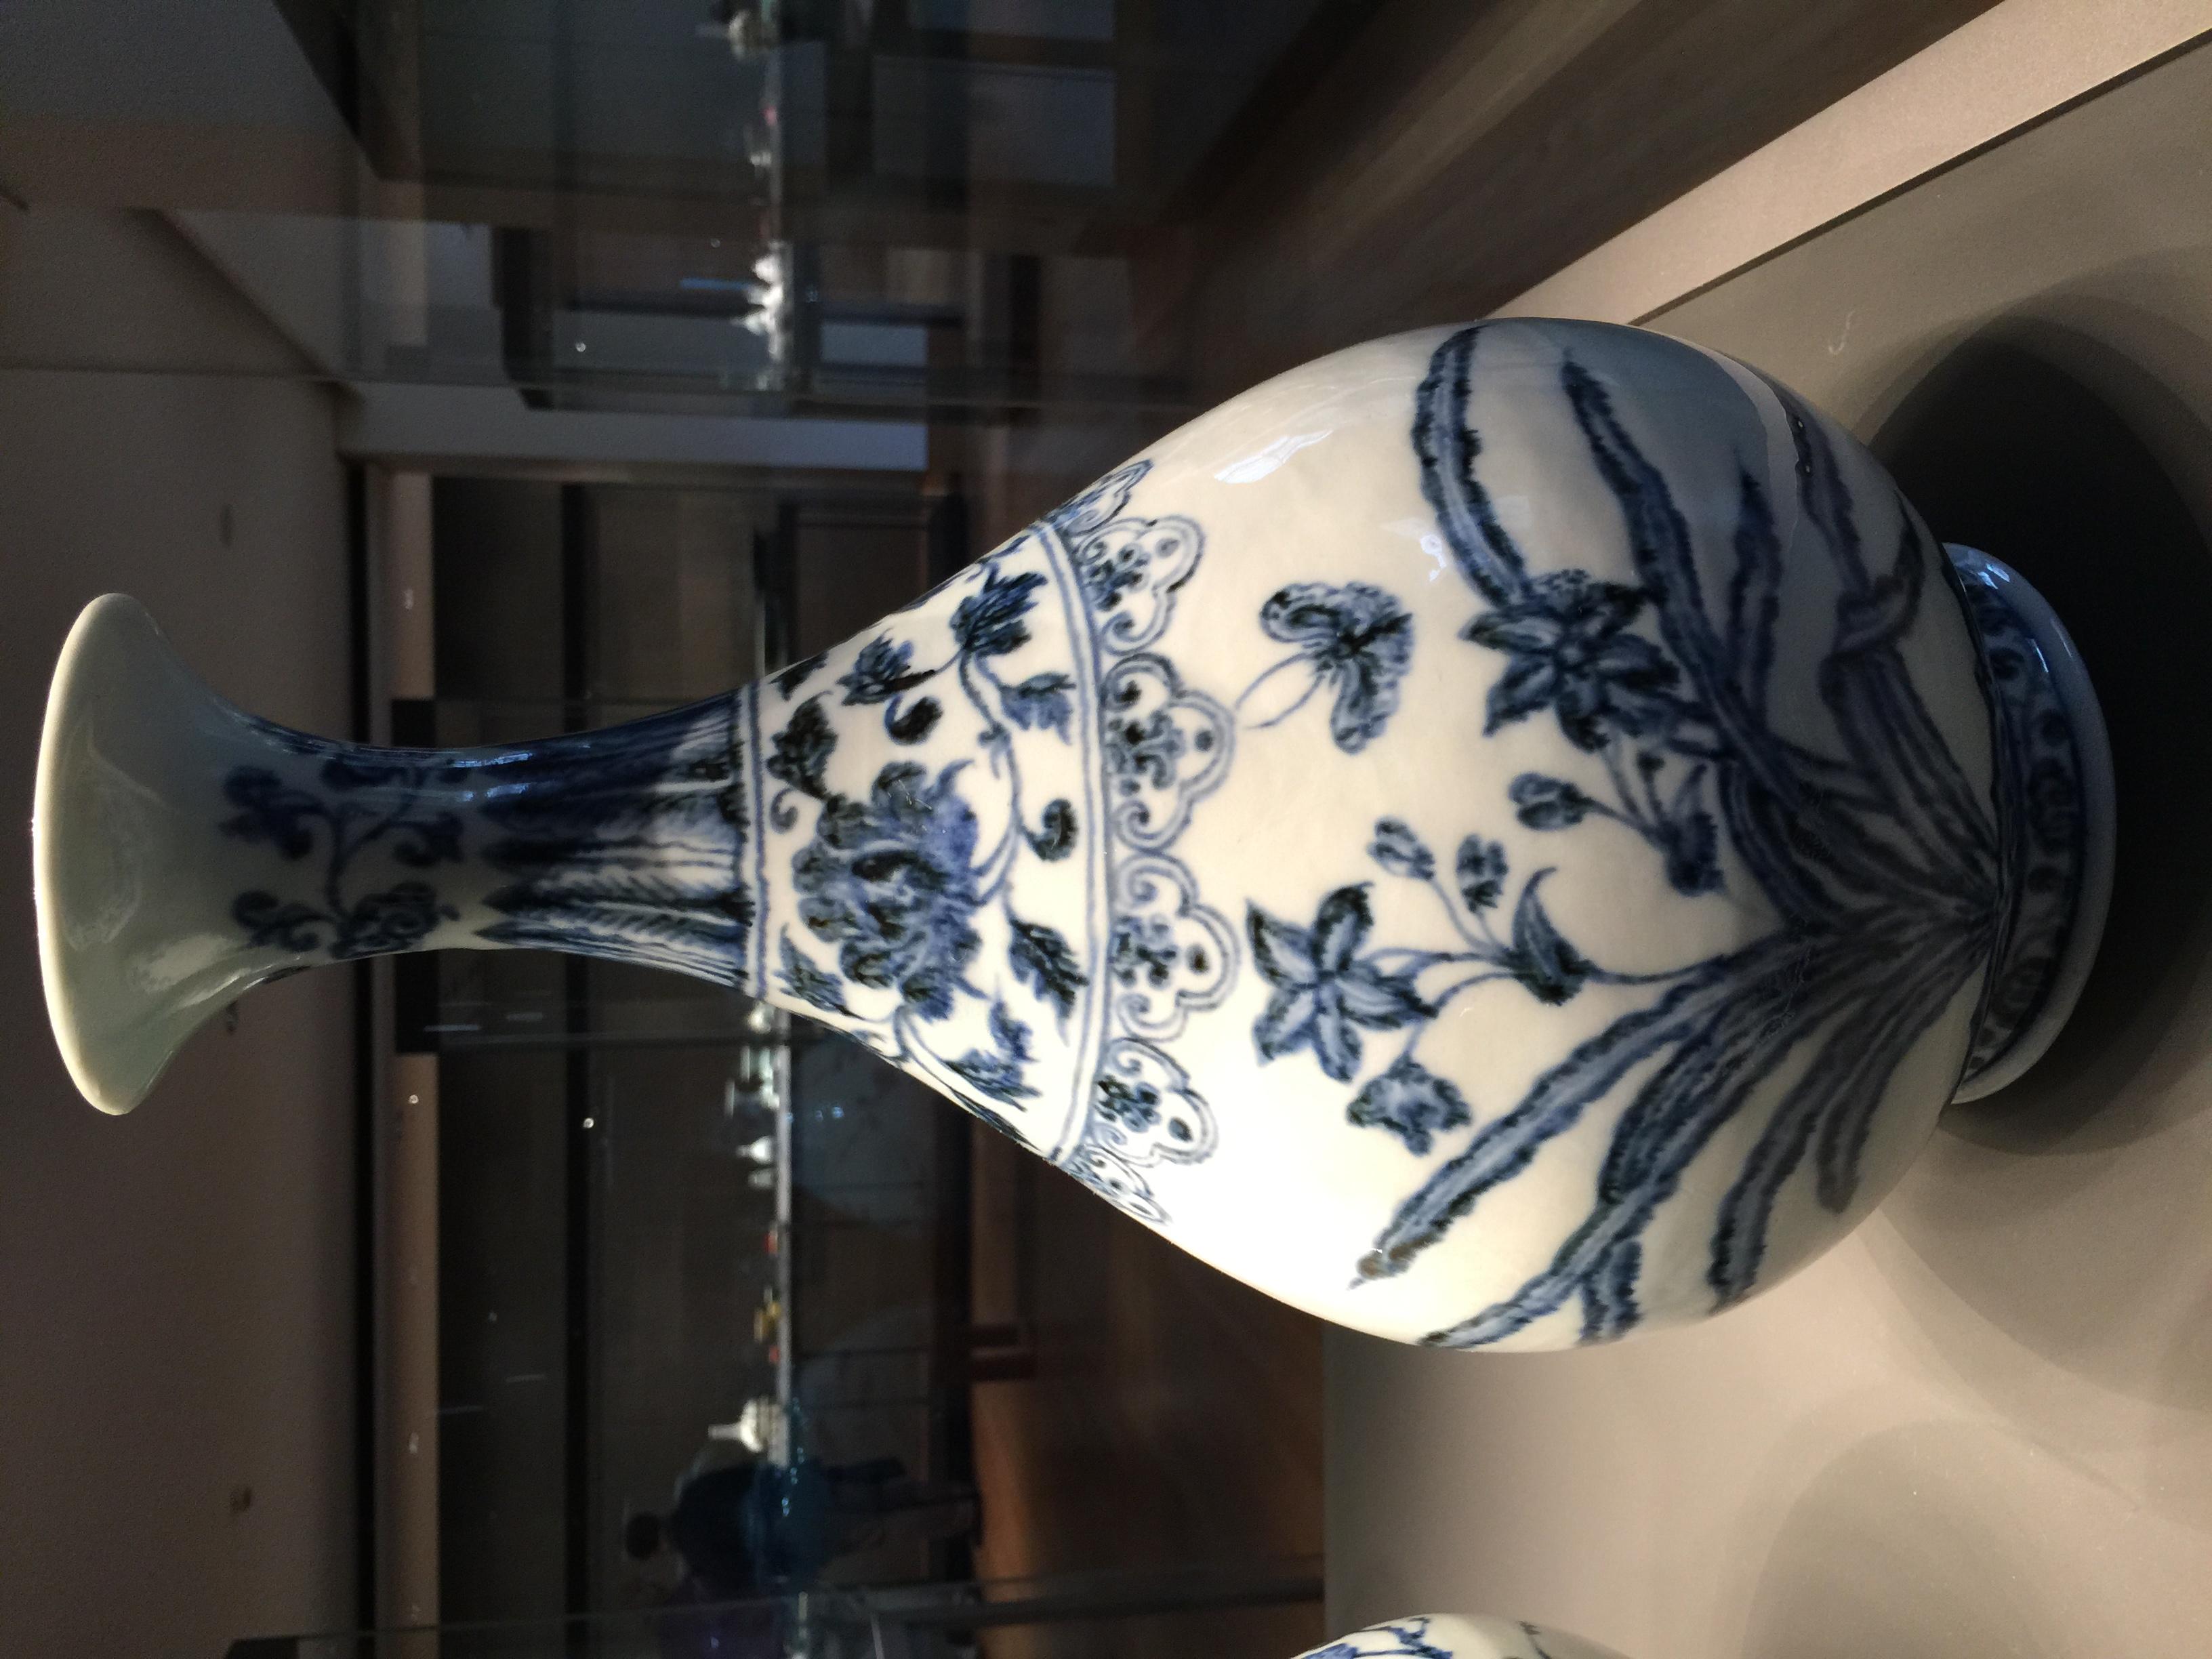 Chinese-Porcelain-British-Museum-Percival-David-jessewaugh.com-35.jpg